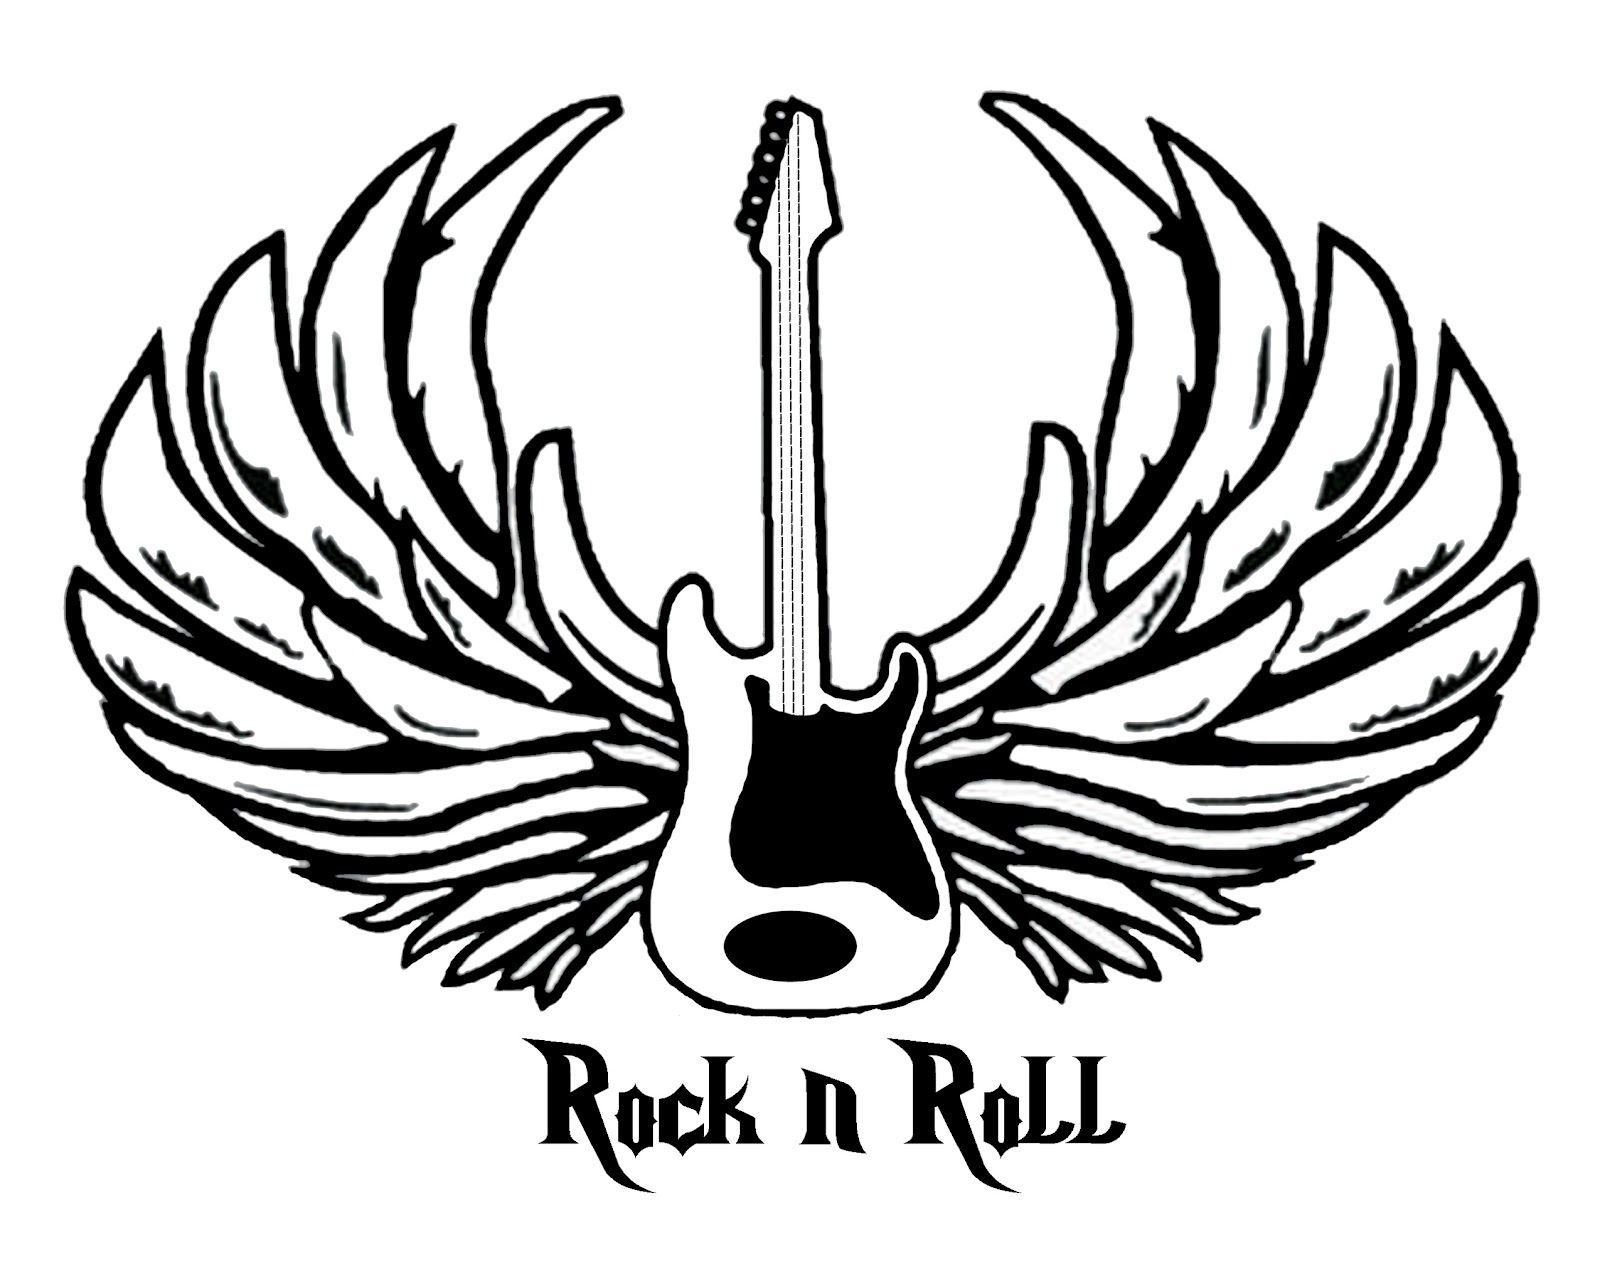 rock n roll valores emocionais harley davidson pinterest